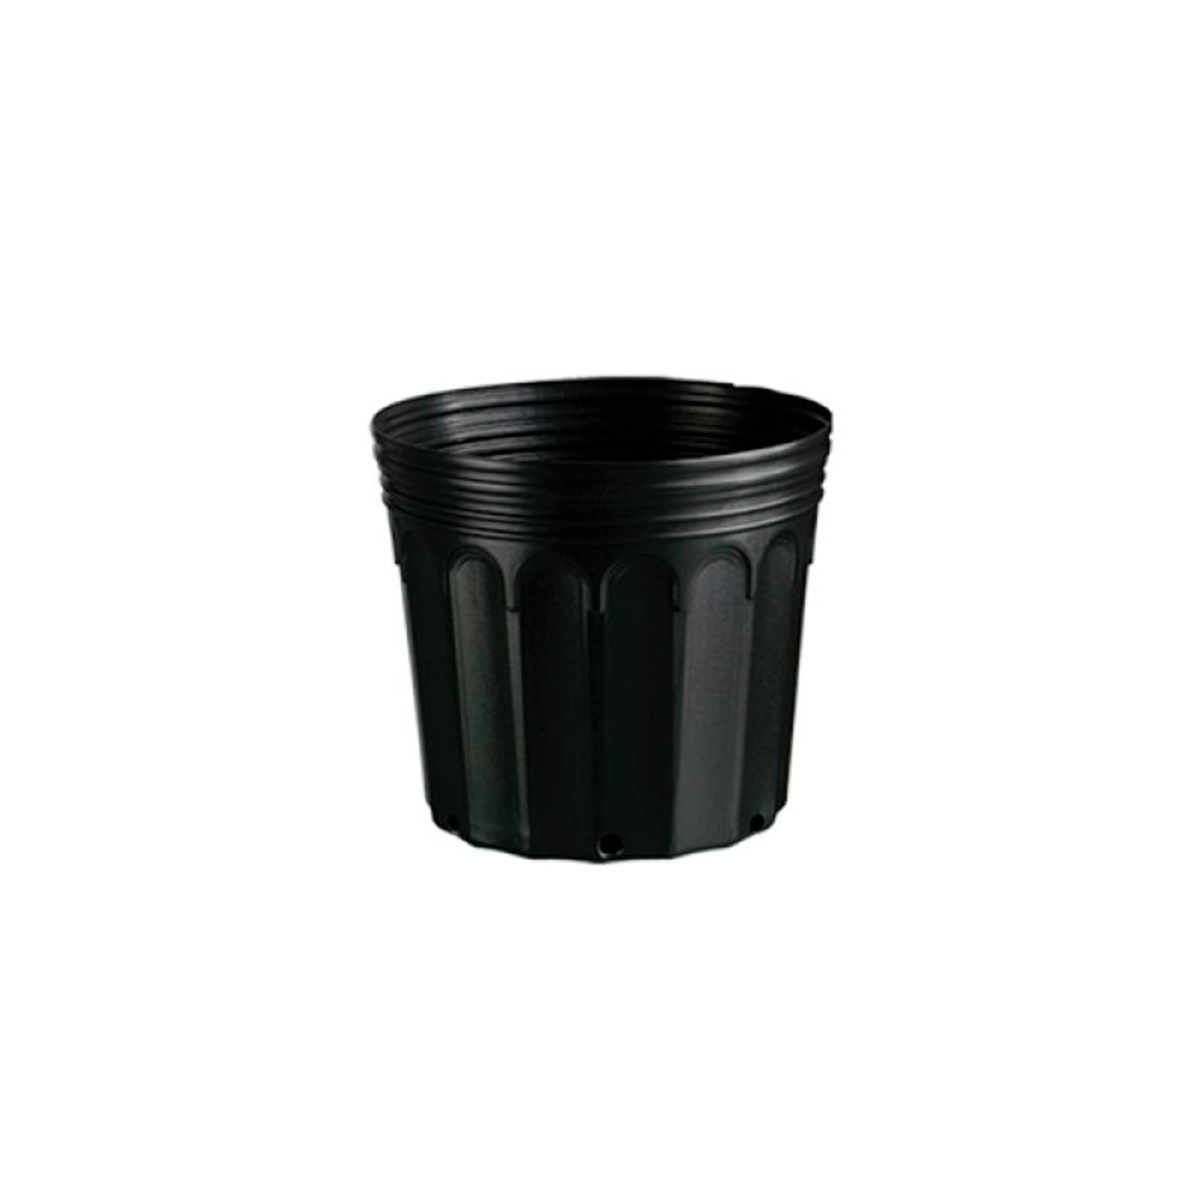 Kit 40 Embalagem para Mudas Flexível Plástico 8,5L